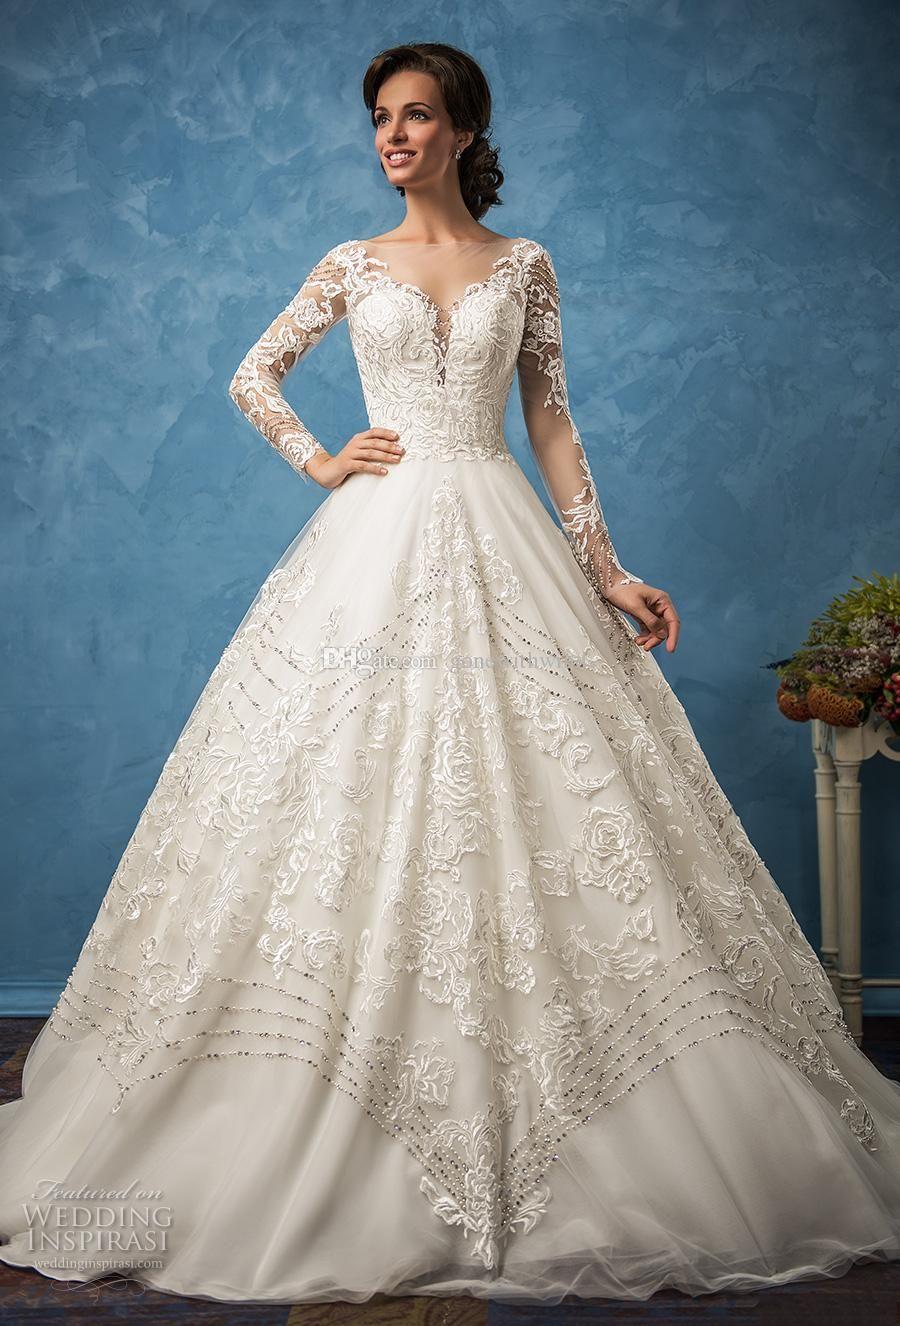 Colorful Vestidos Novia Outlet Zaragoza Ideas - All Wedding Dresses ...